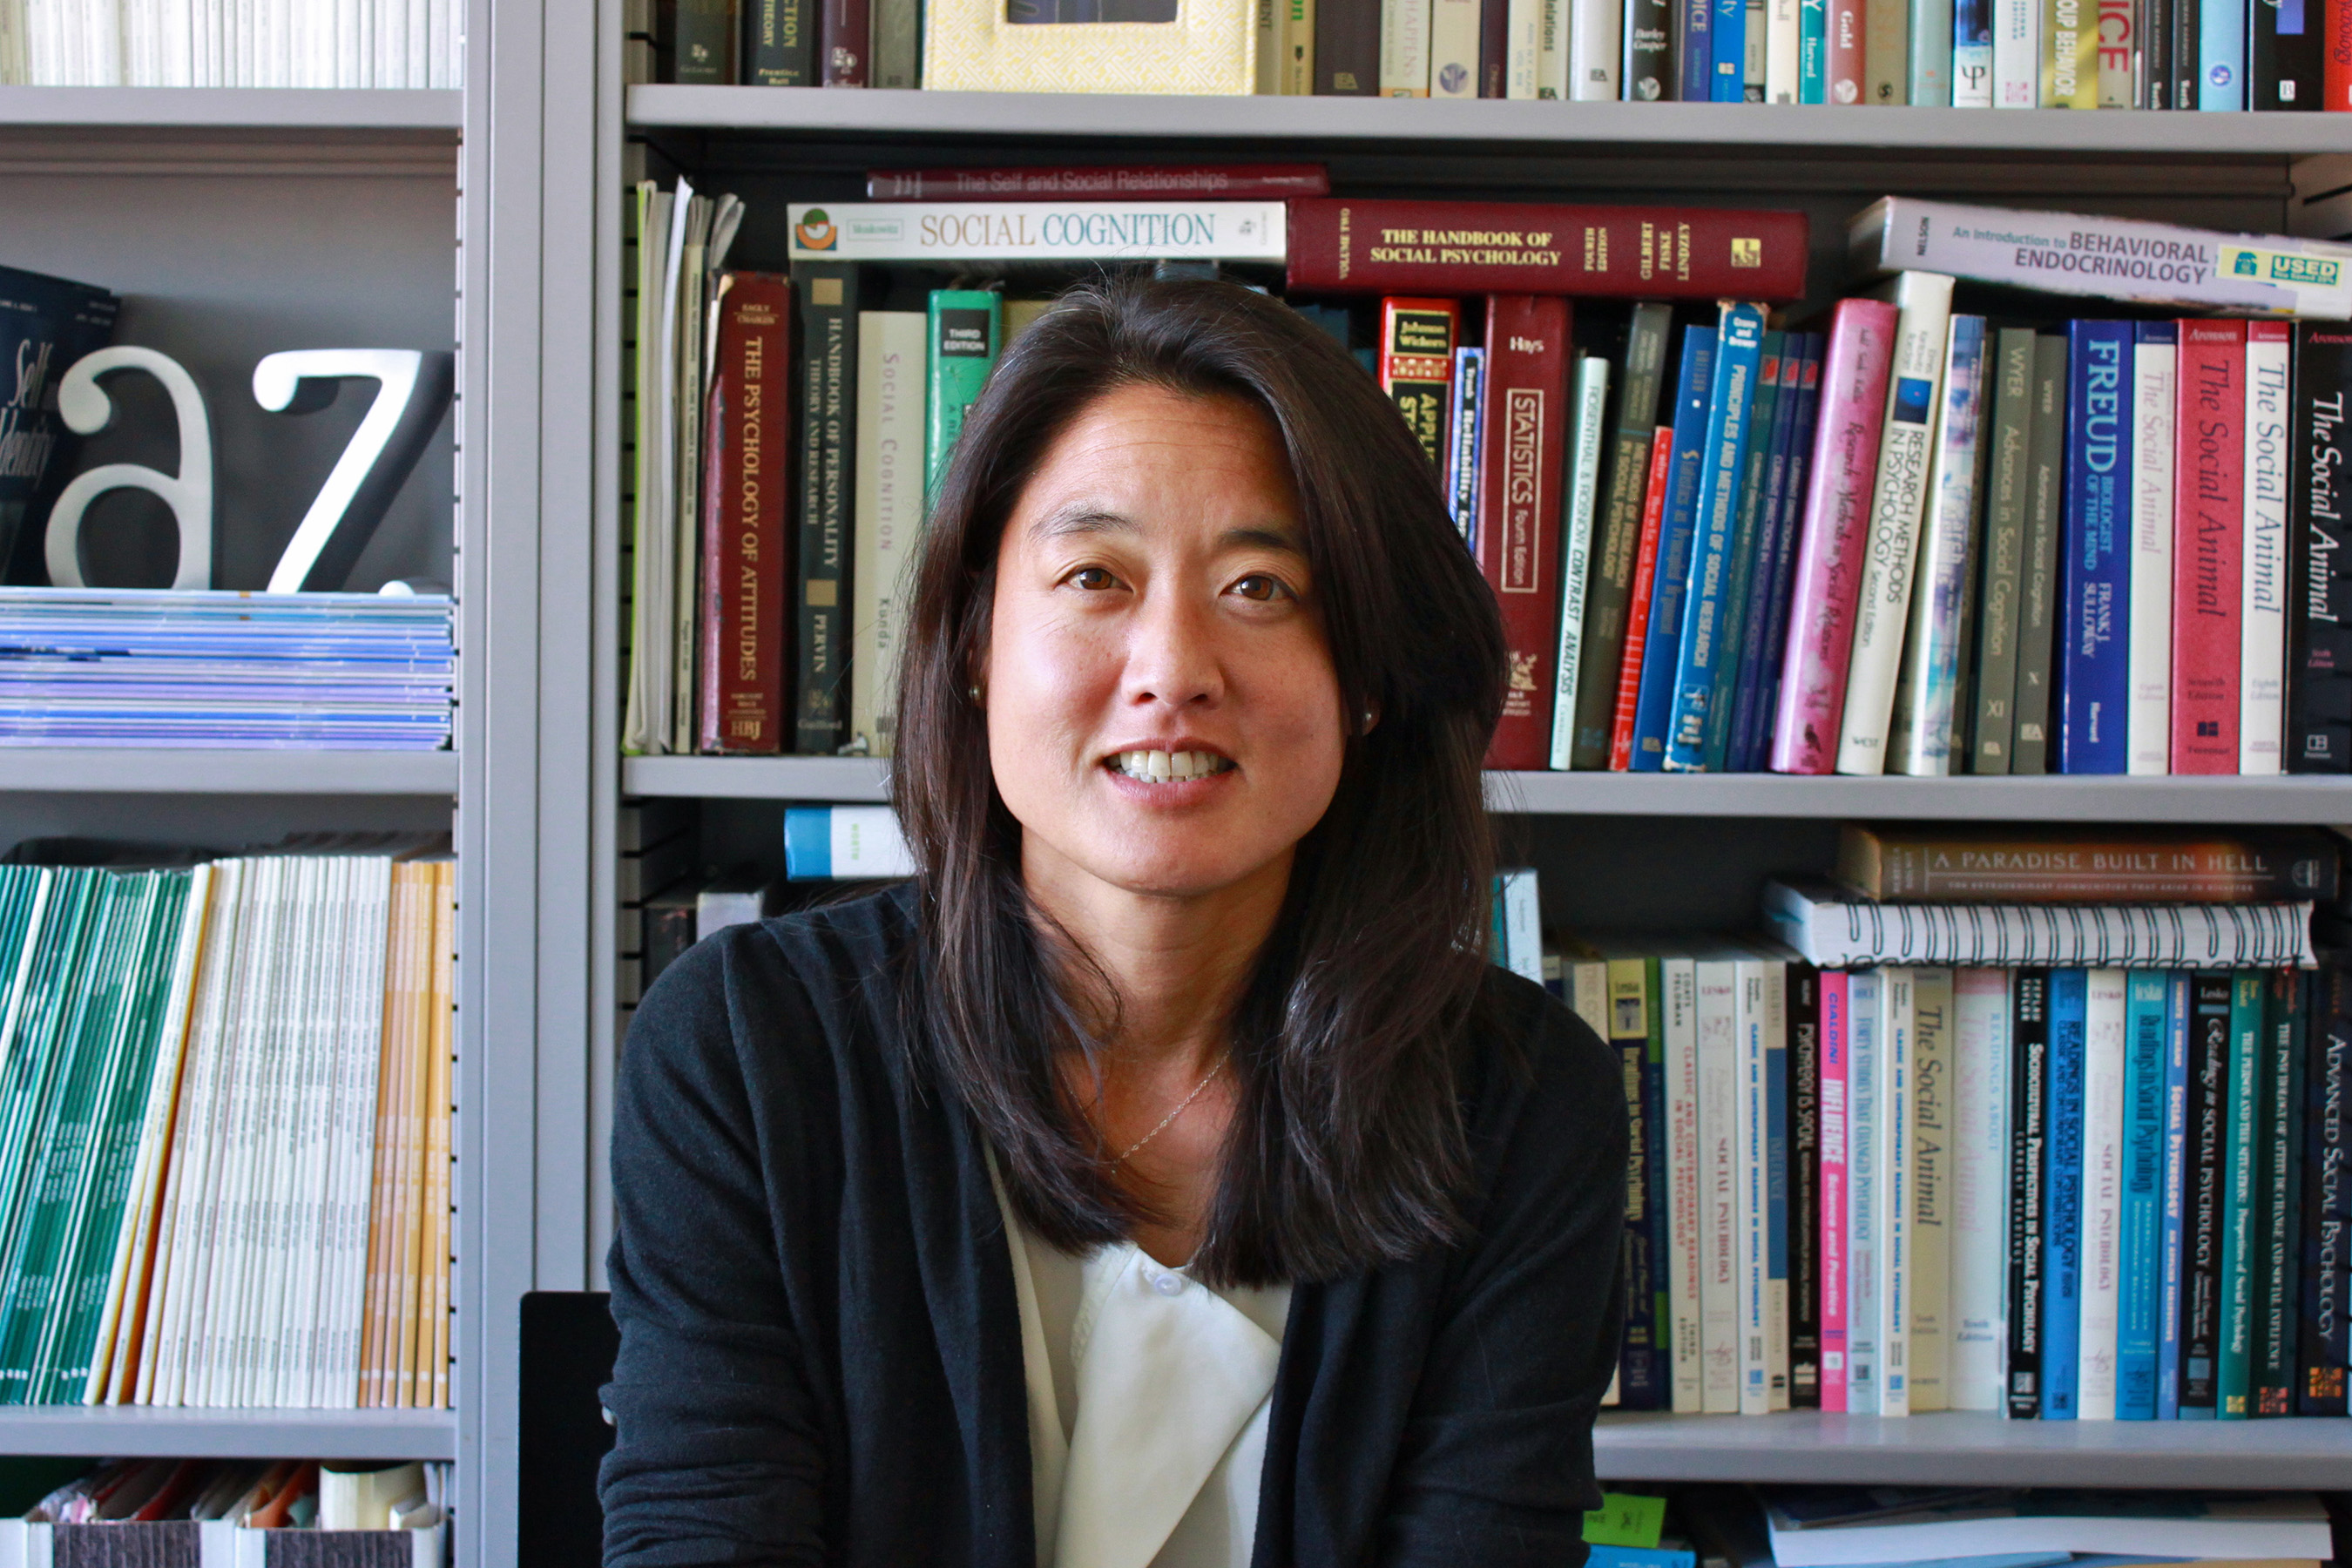 Dr. Serena Chen